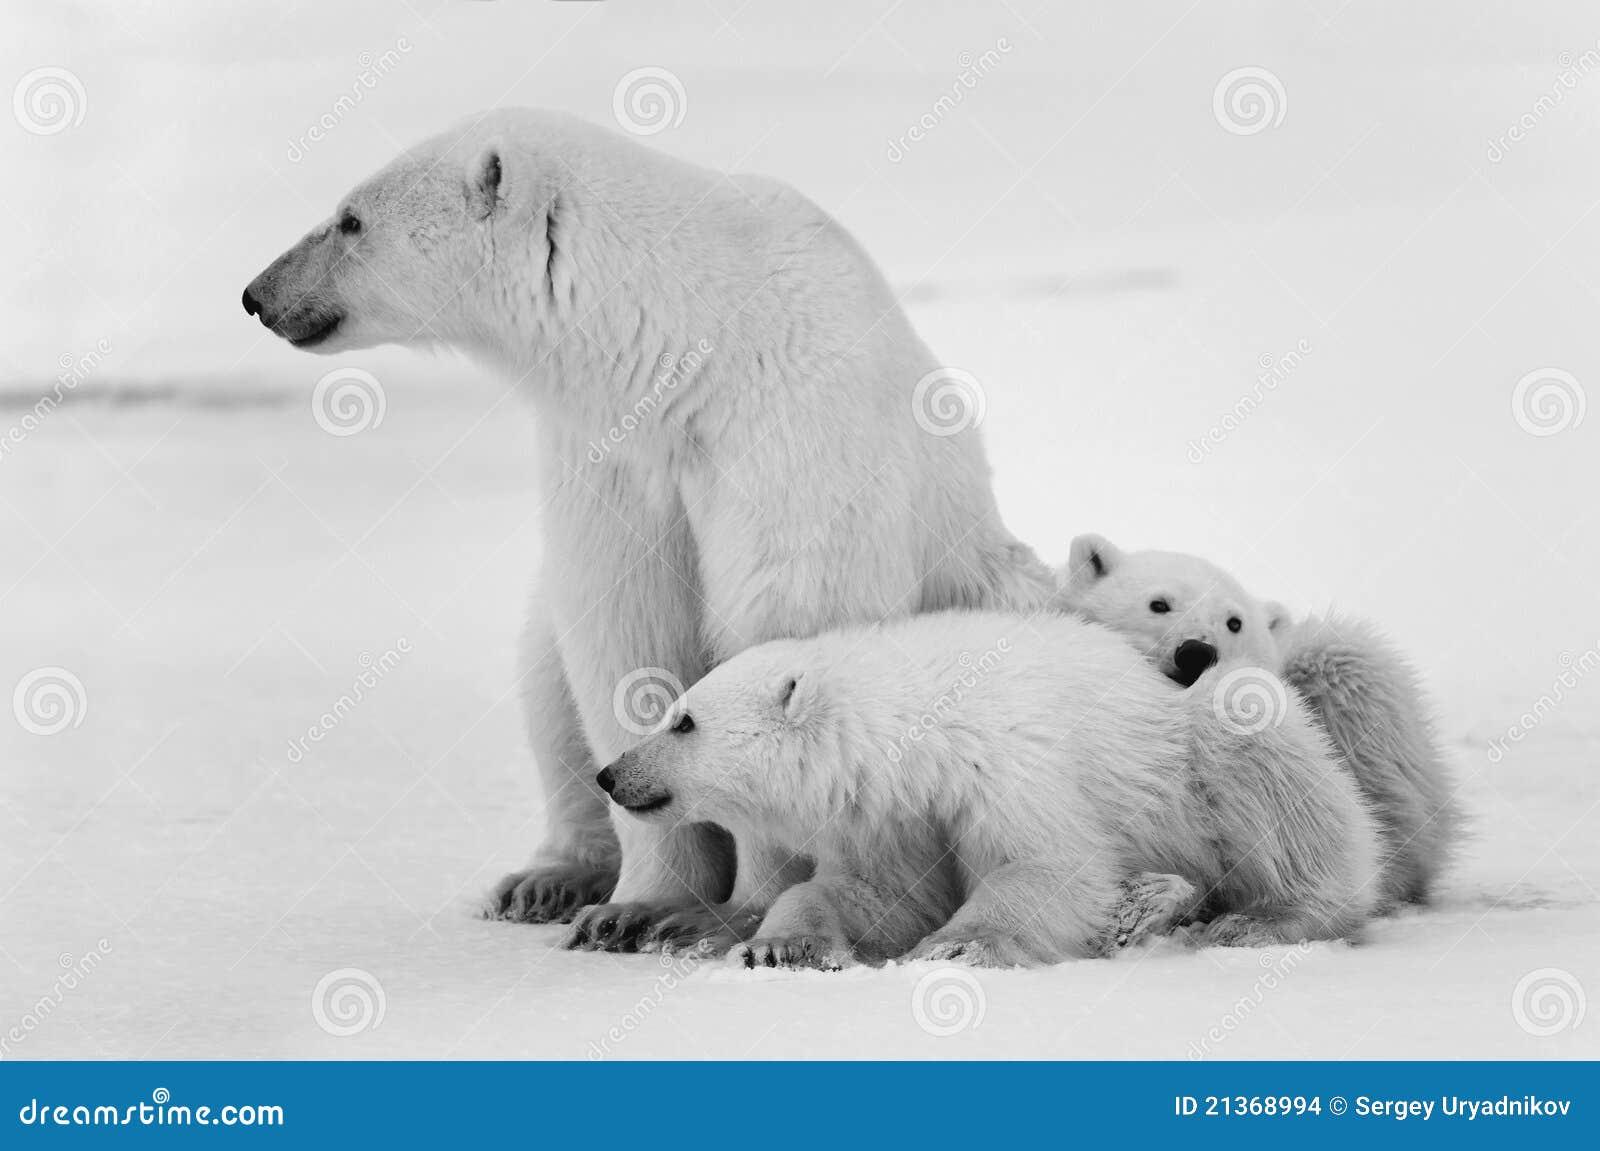 Two polar bears playfighting